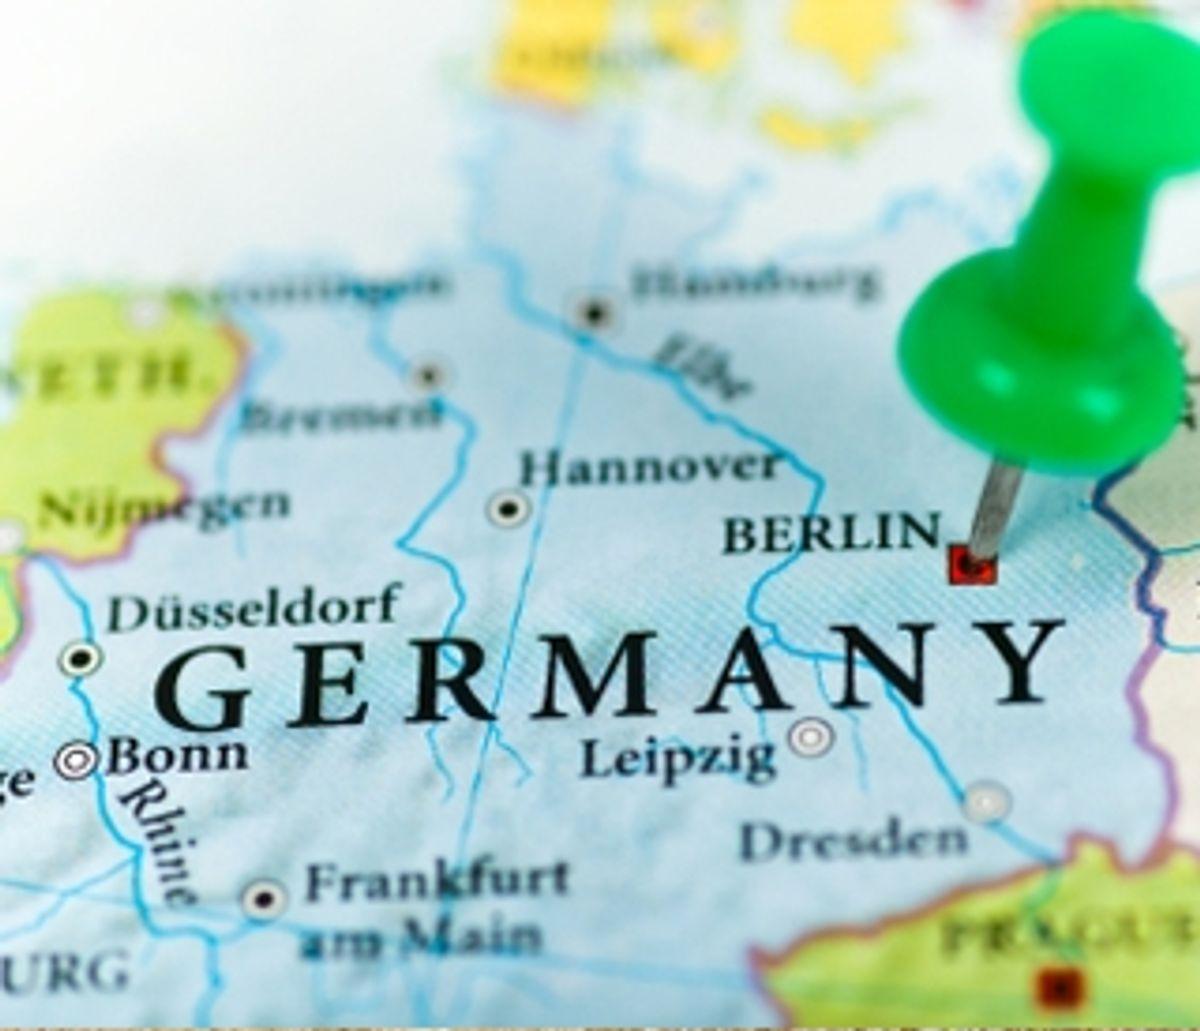 Penske Logistics Europe Participates in German Logistics Association Conference